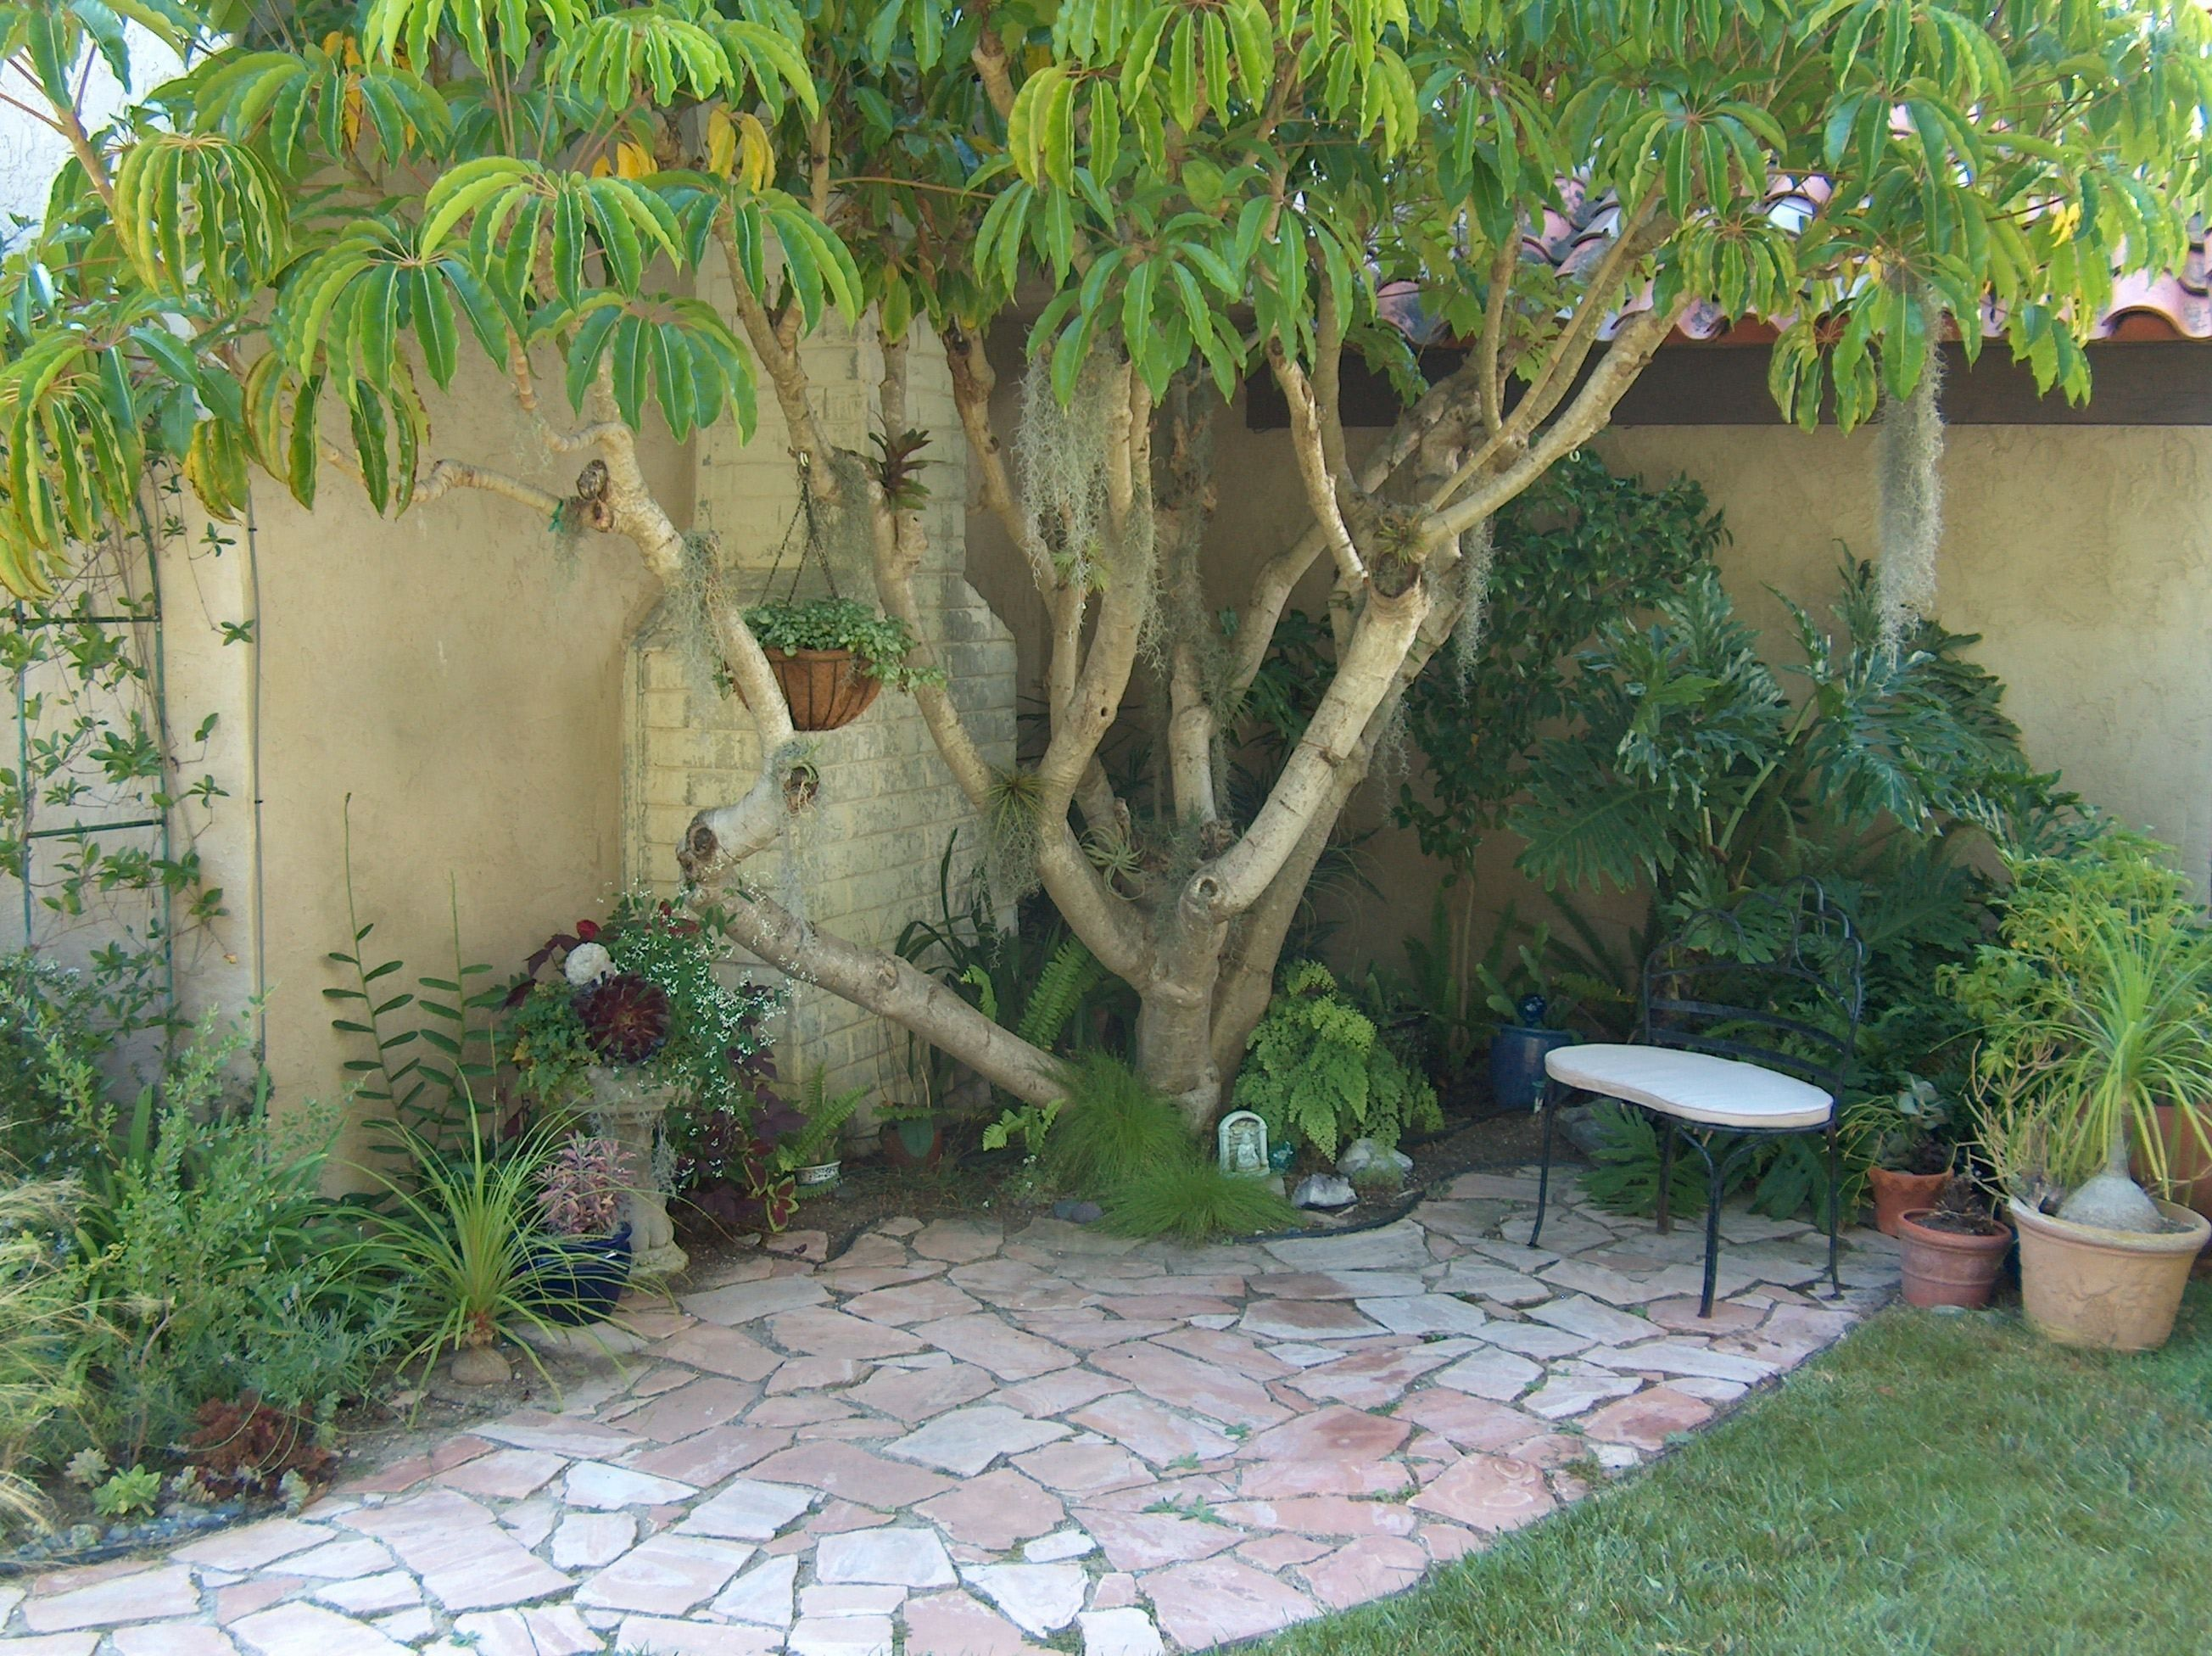 10 Meditation Garden Ideas, Amazing as well as Interesting ... on Meditation Patio Ideas id=86040